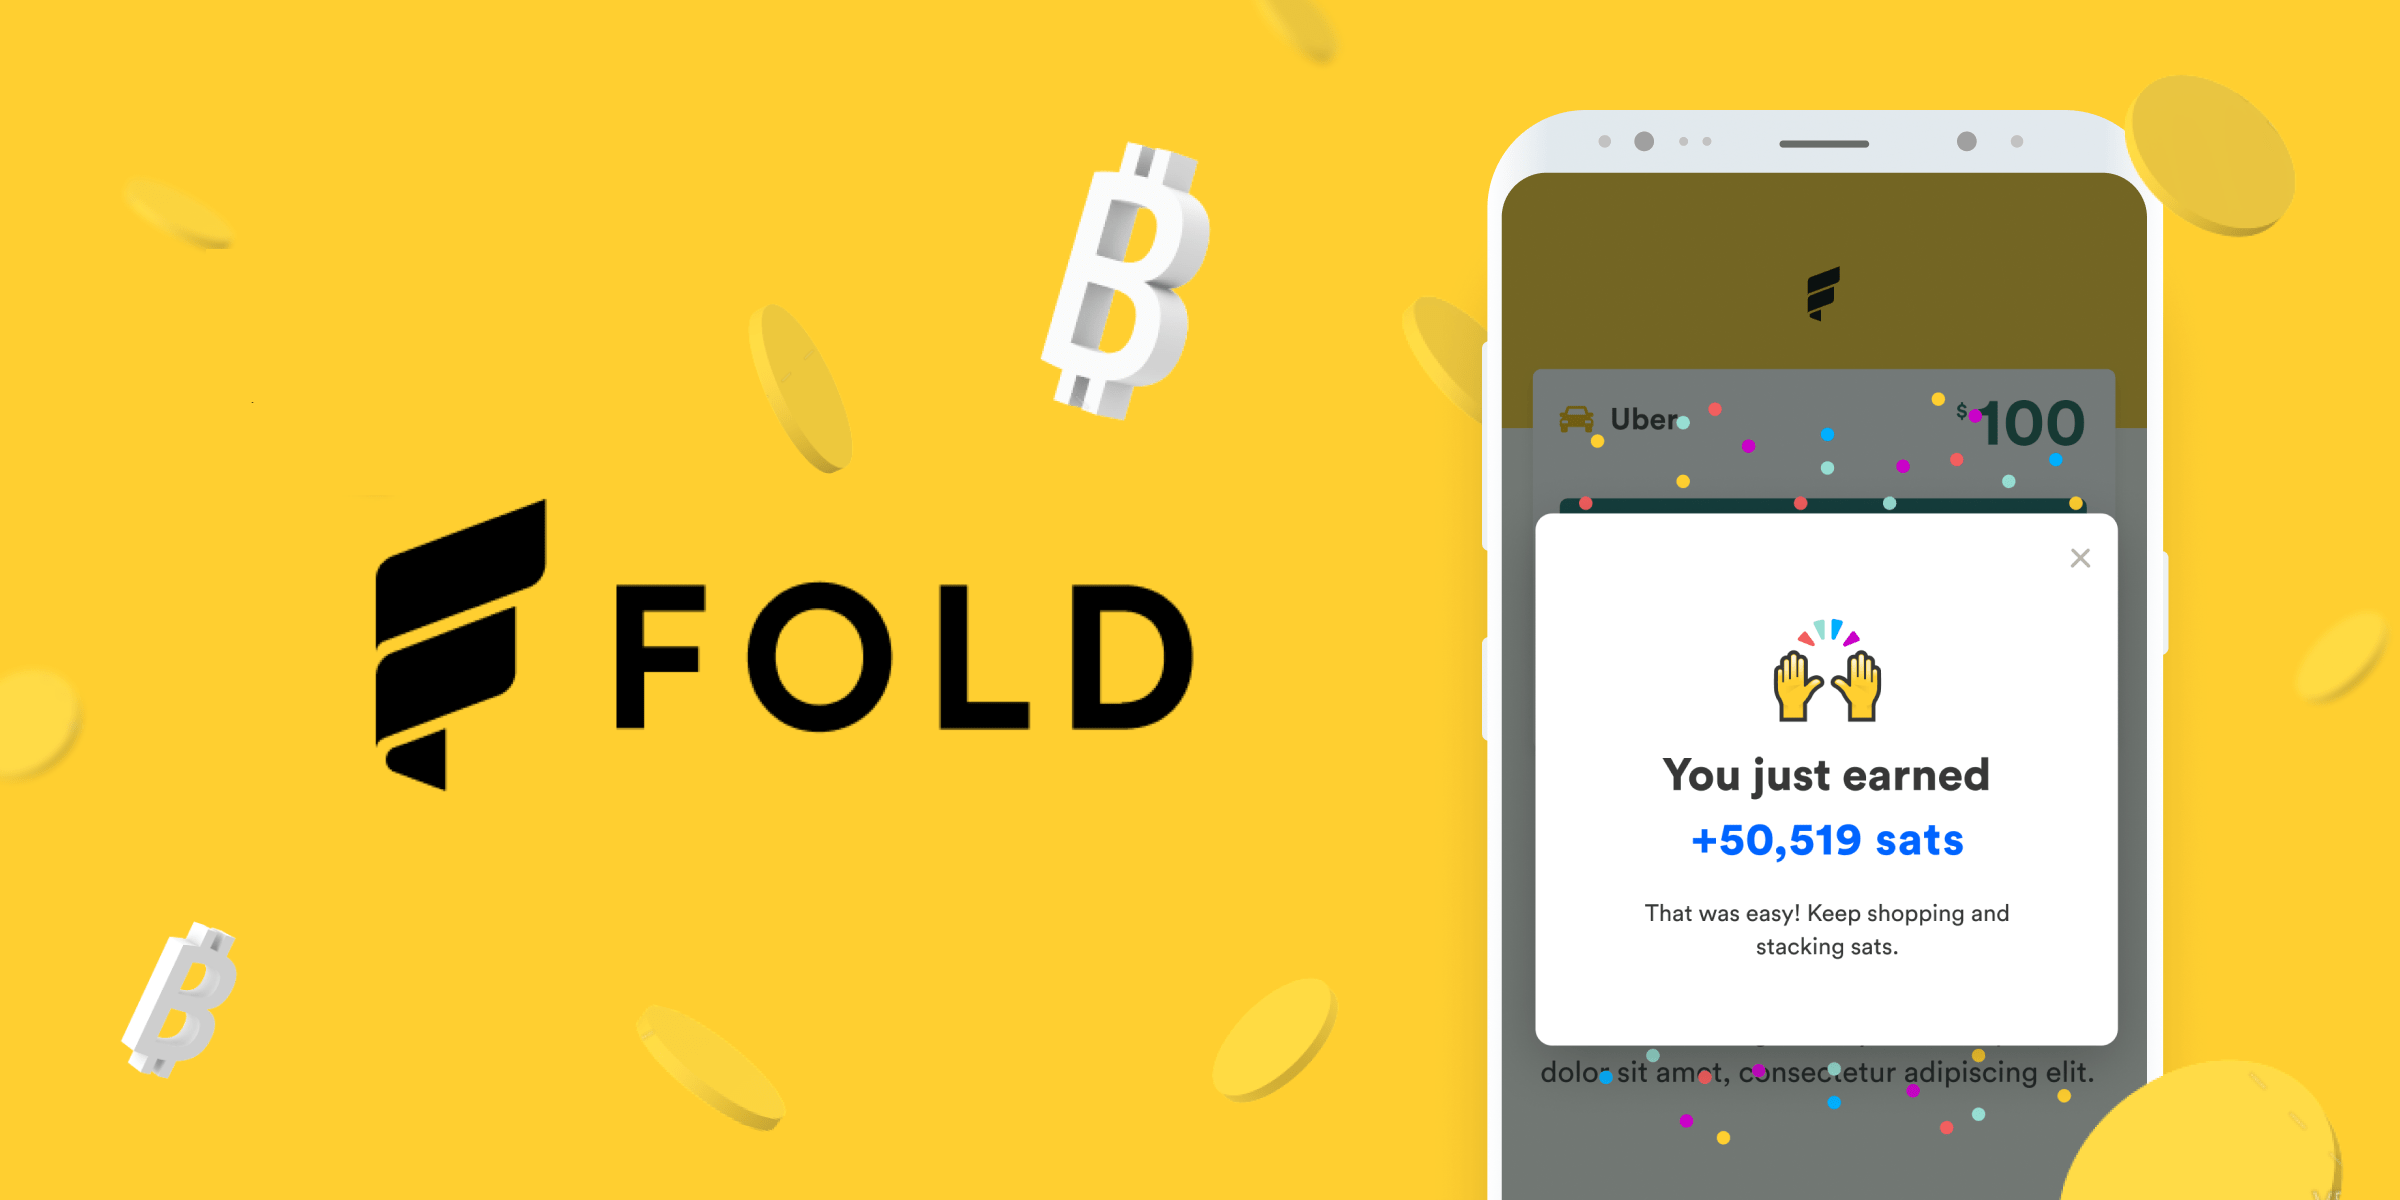 fold app